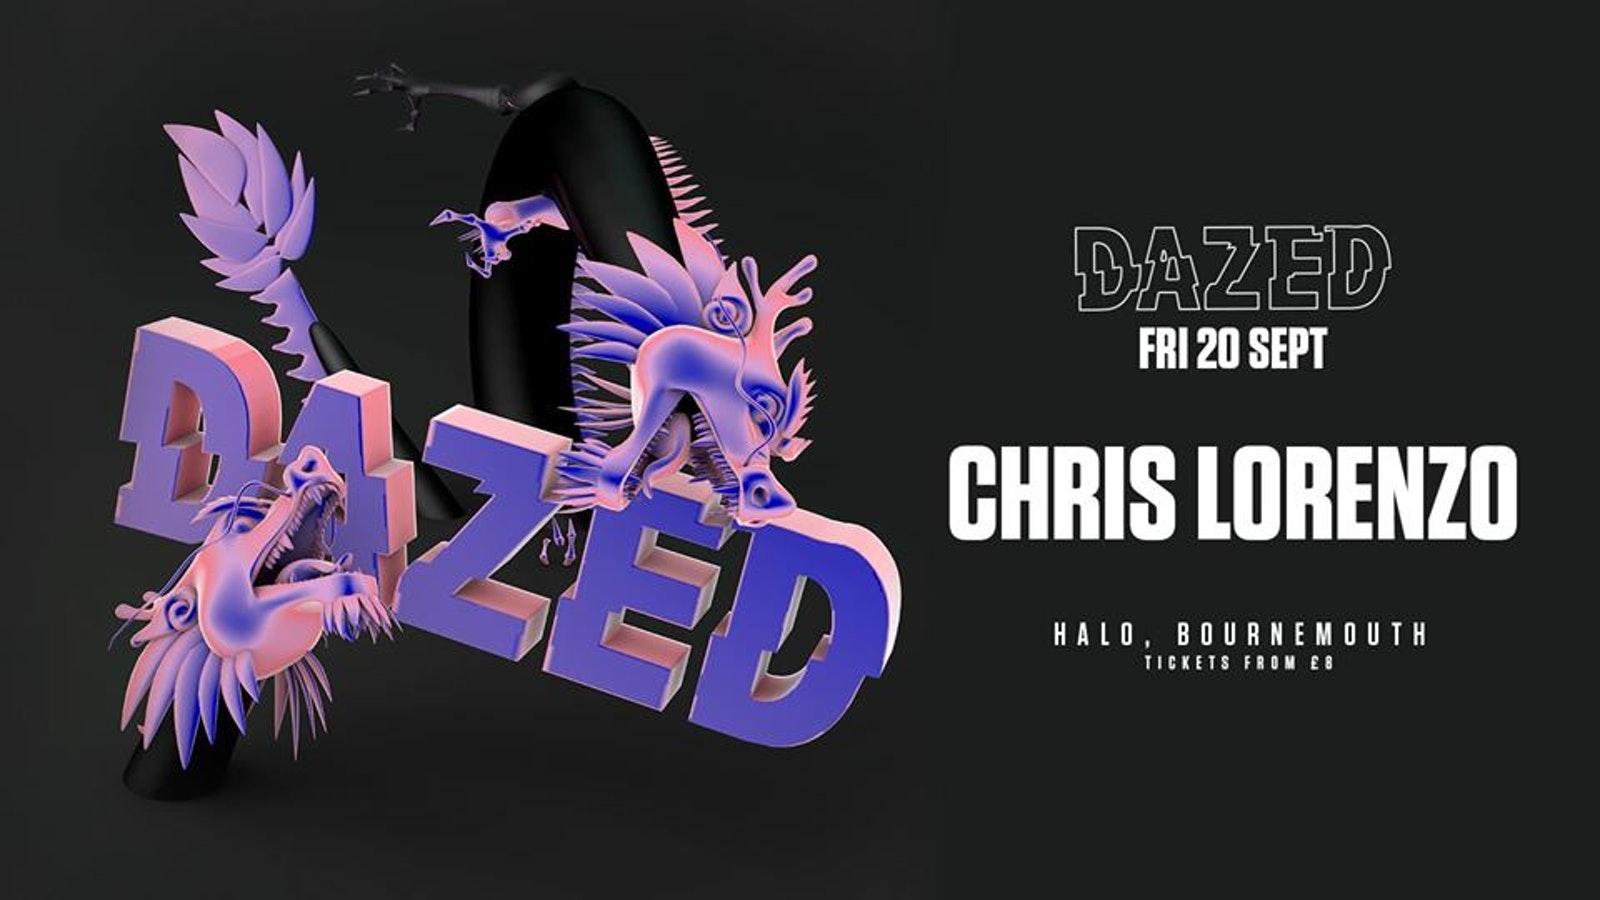 DAZED present: Chris Lorenzo